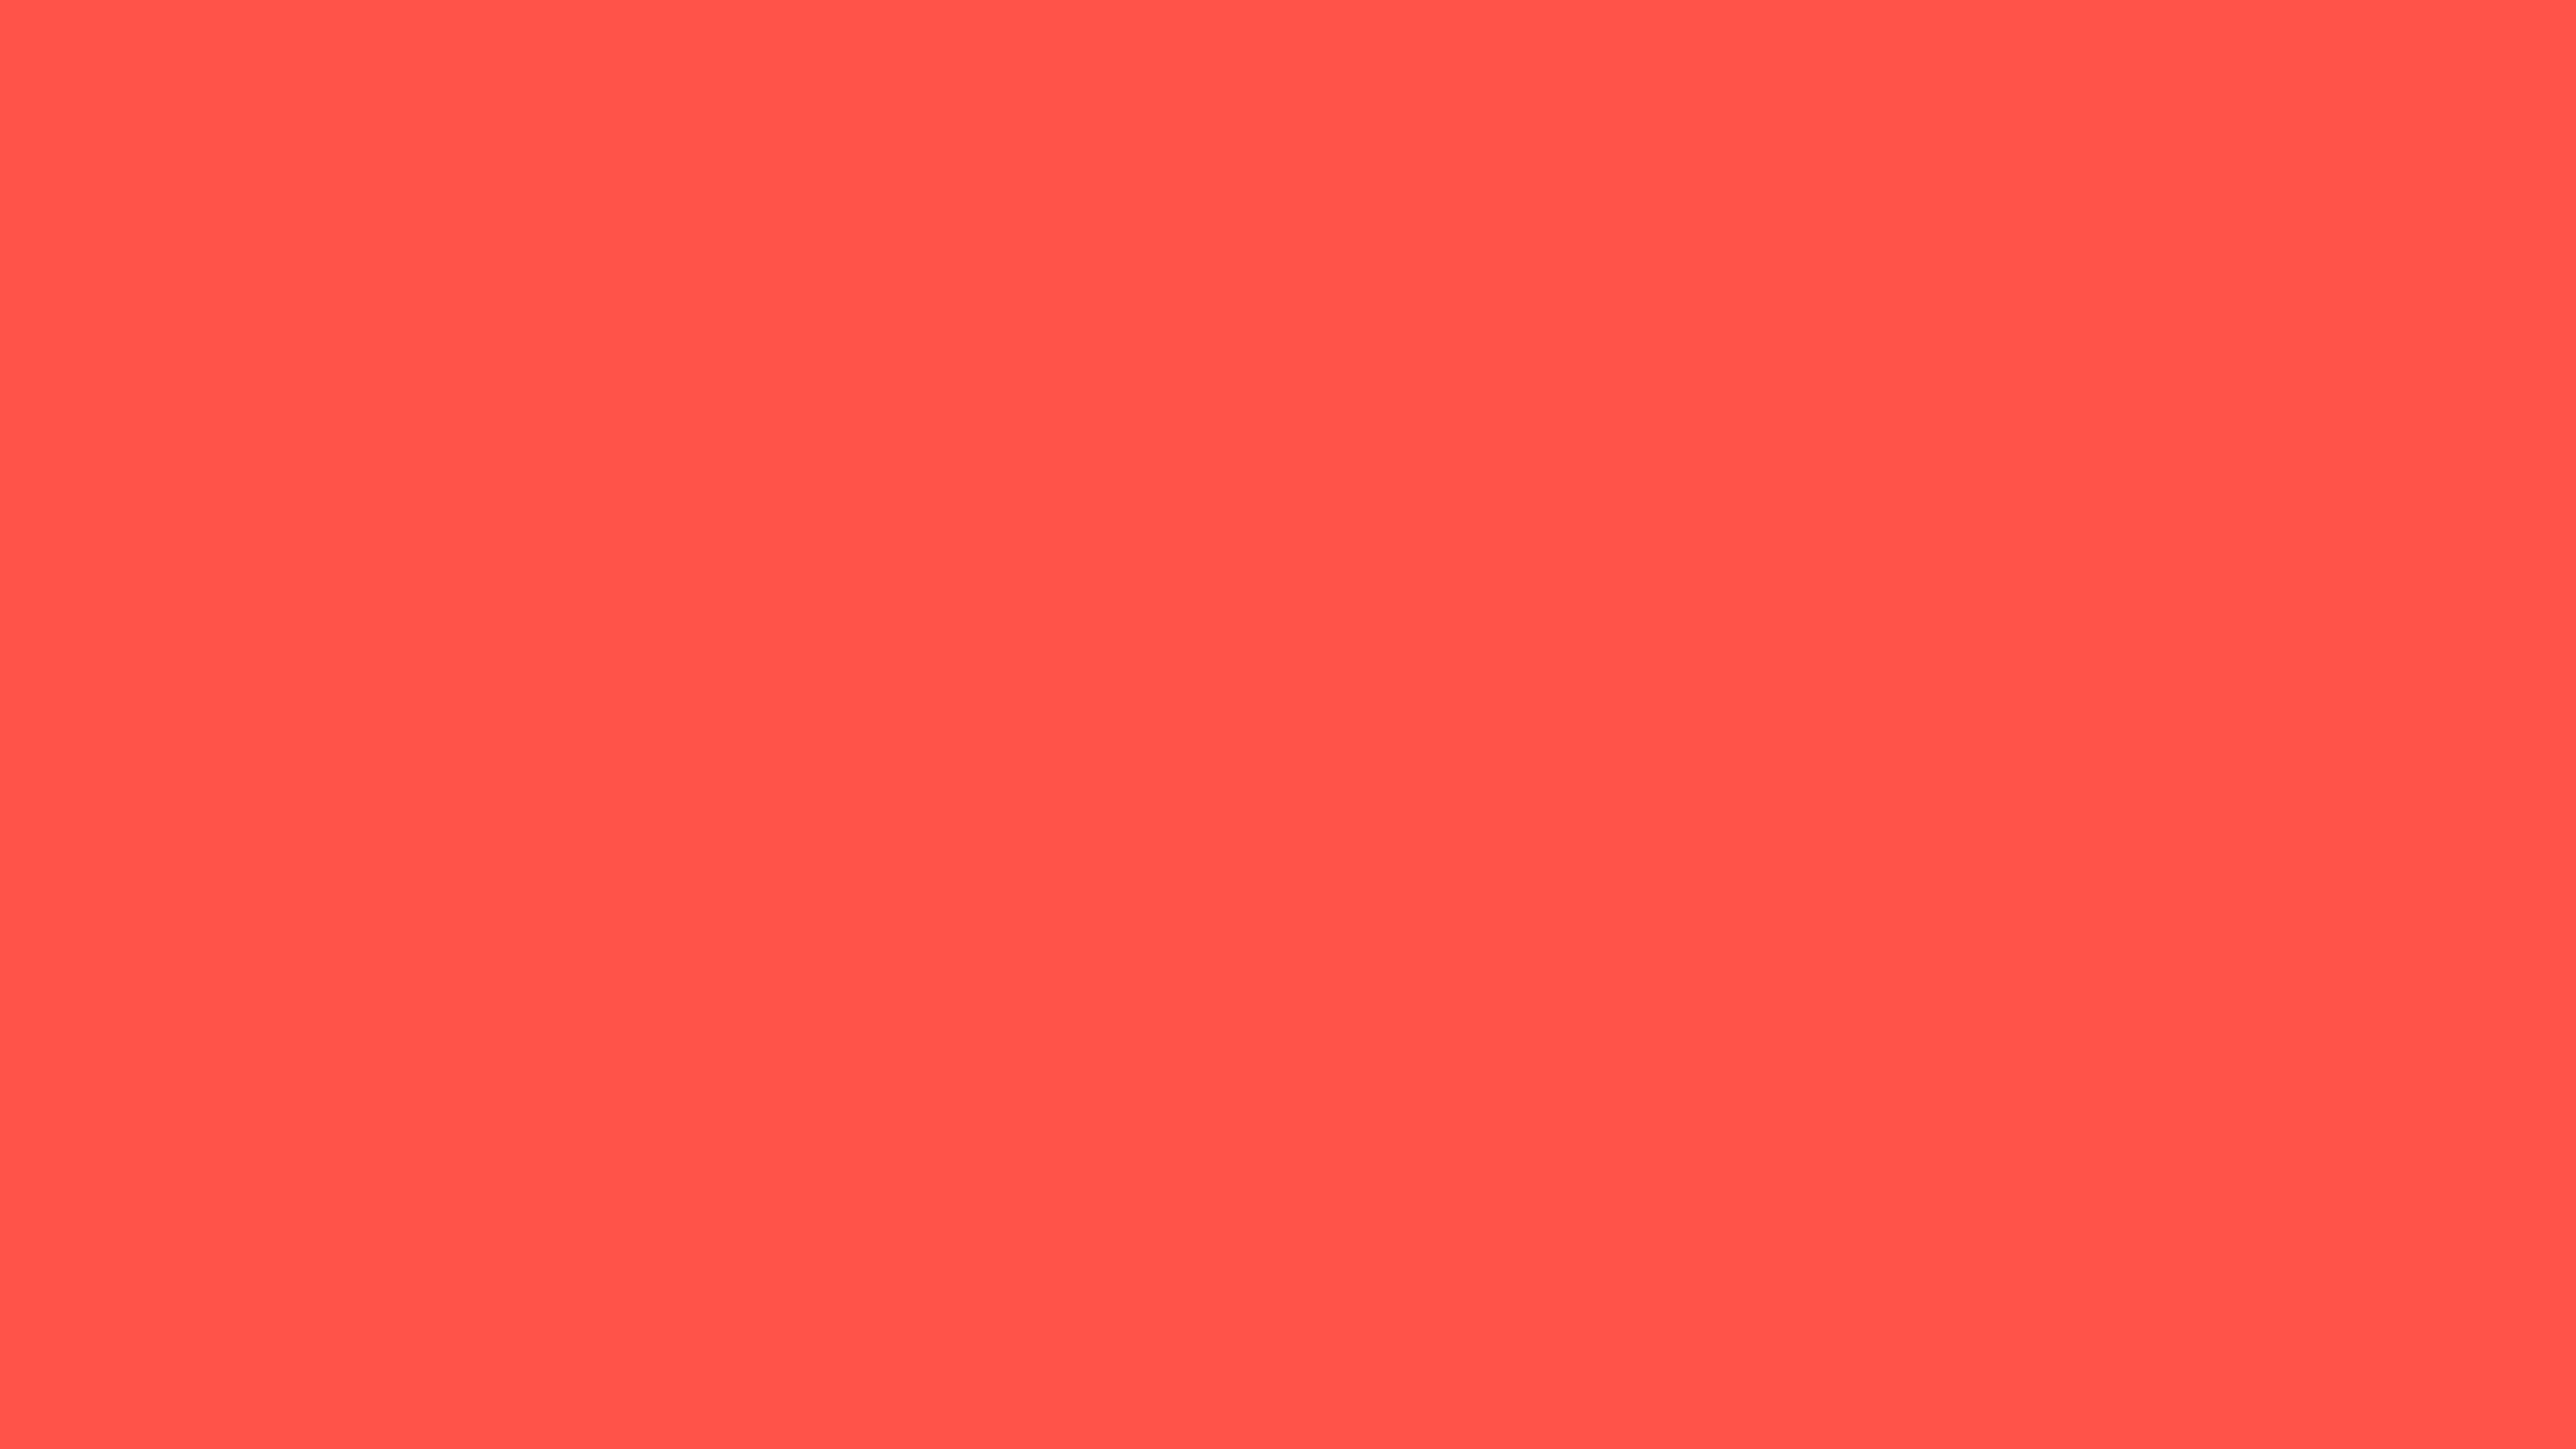 7680x4320 Red-orange Solid Color Background